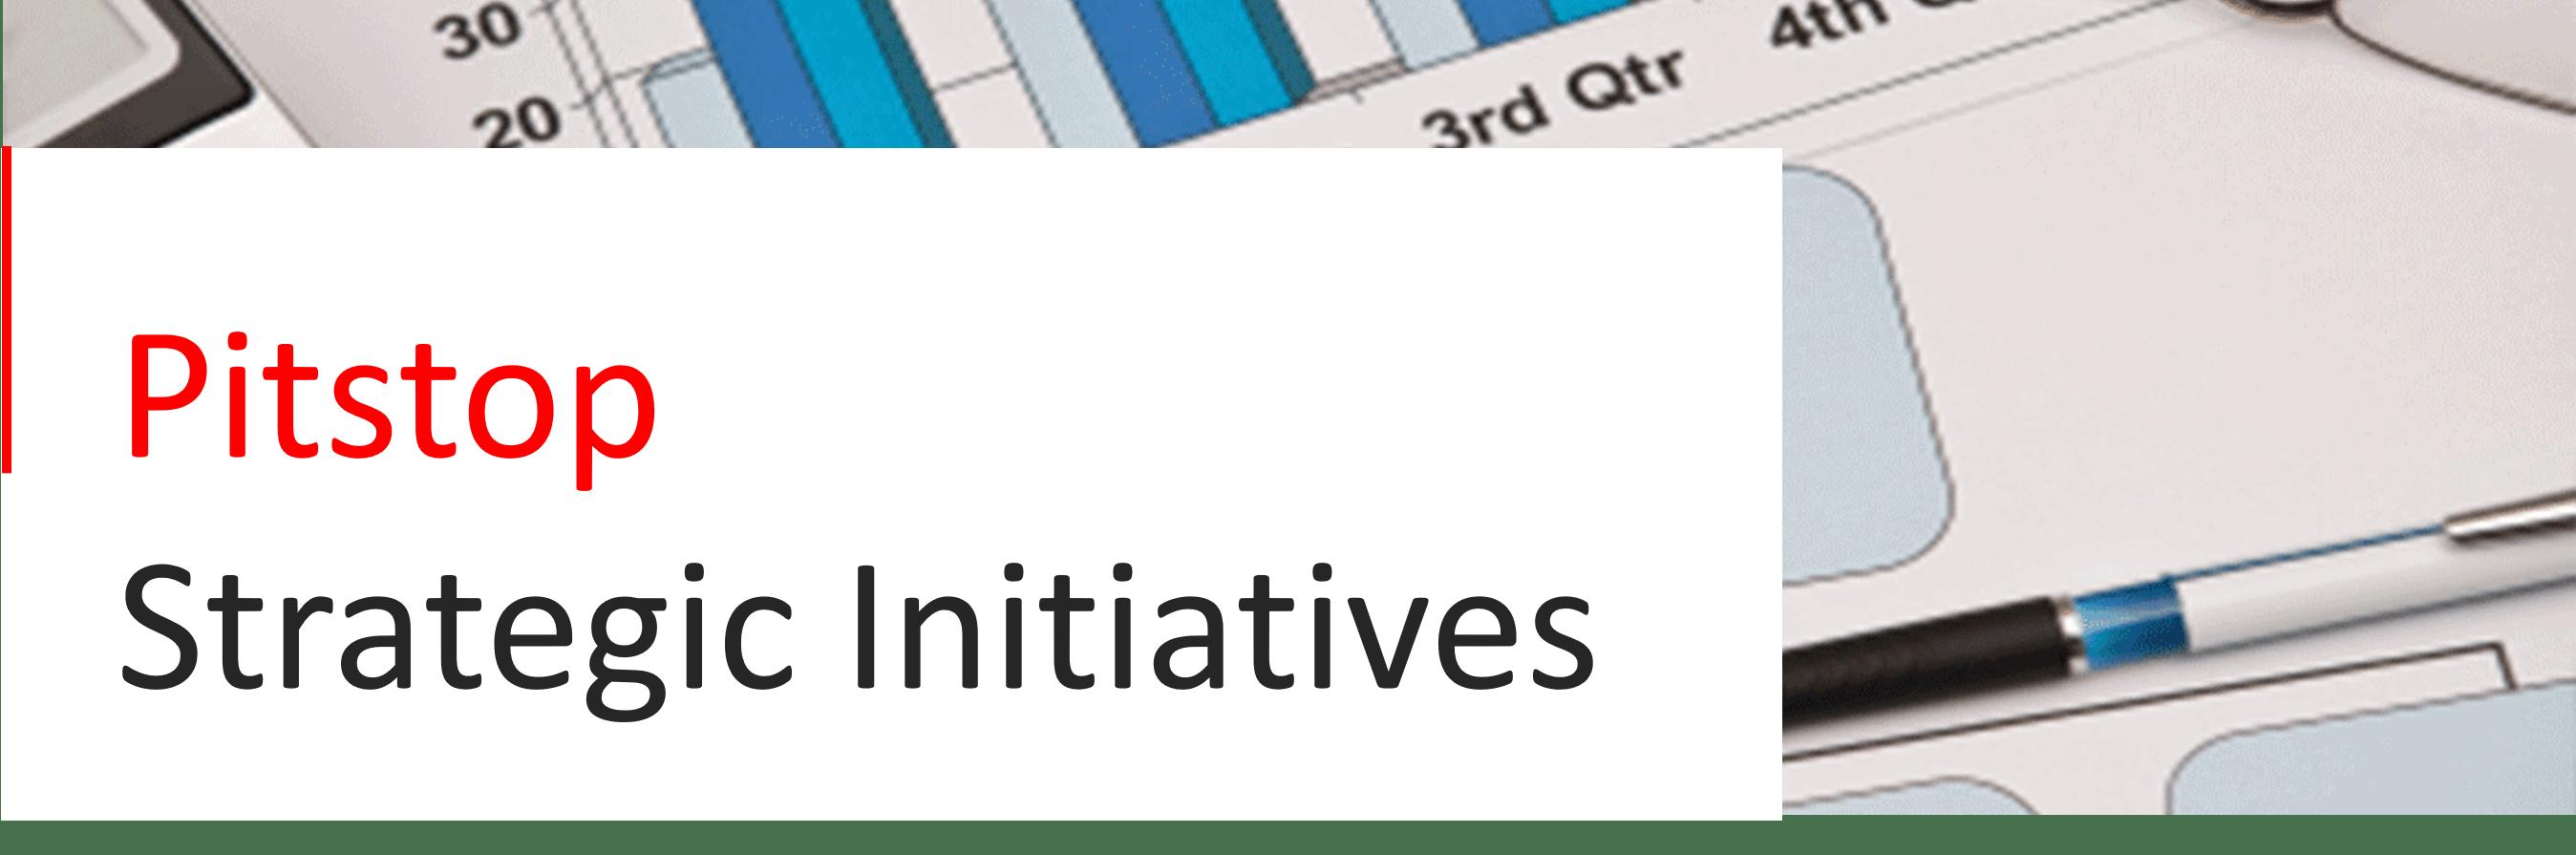 pitstop strategic initiatives